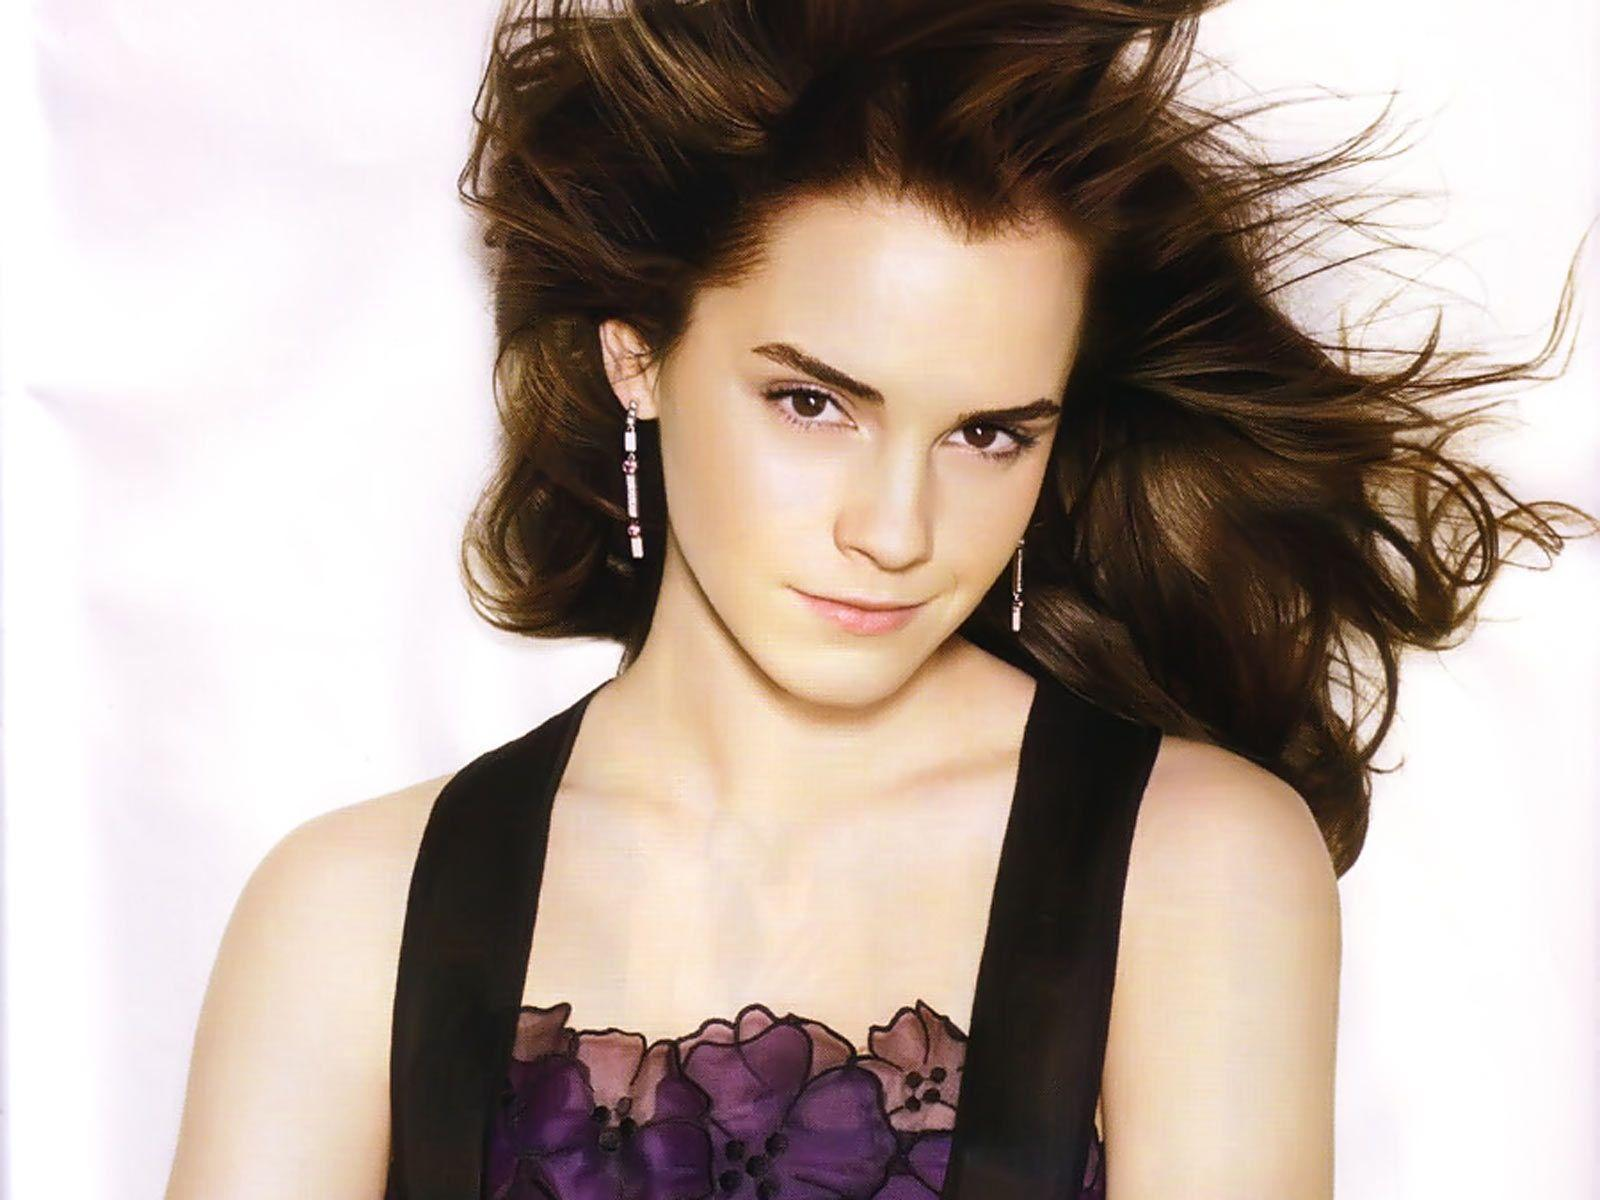 Latest Emma Watson HD Wallpapers Download | HD Free Wallpapers ...